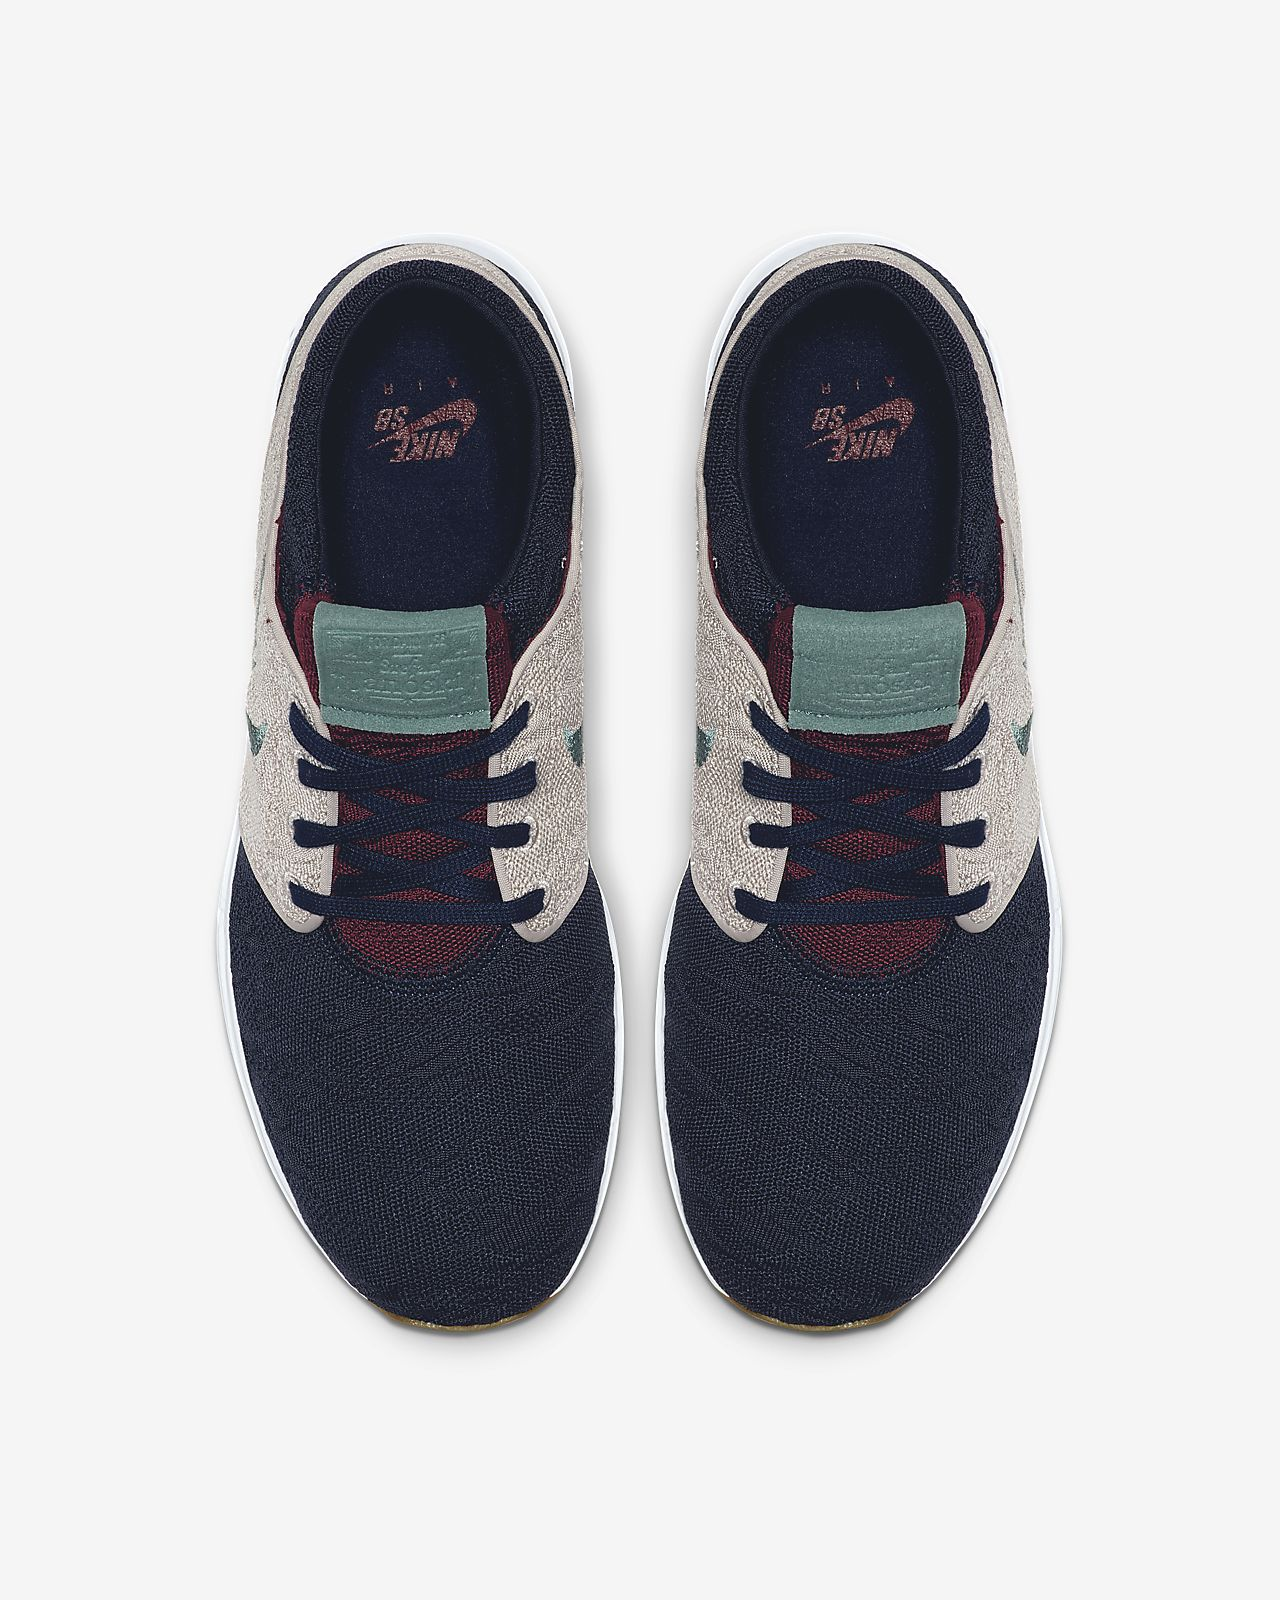 Nike SB Air Max Janoski 2 Shoes (obsidian bicostal)